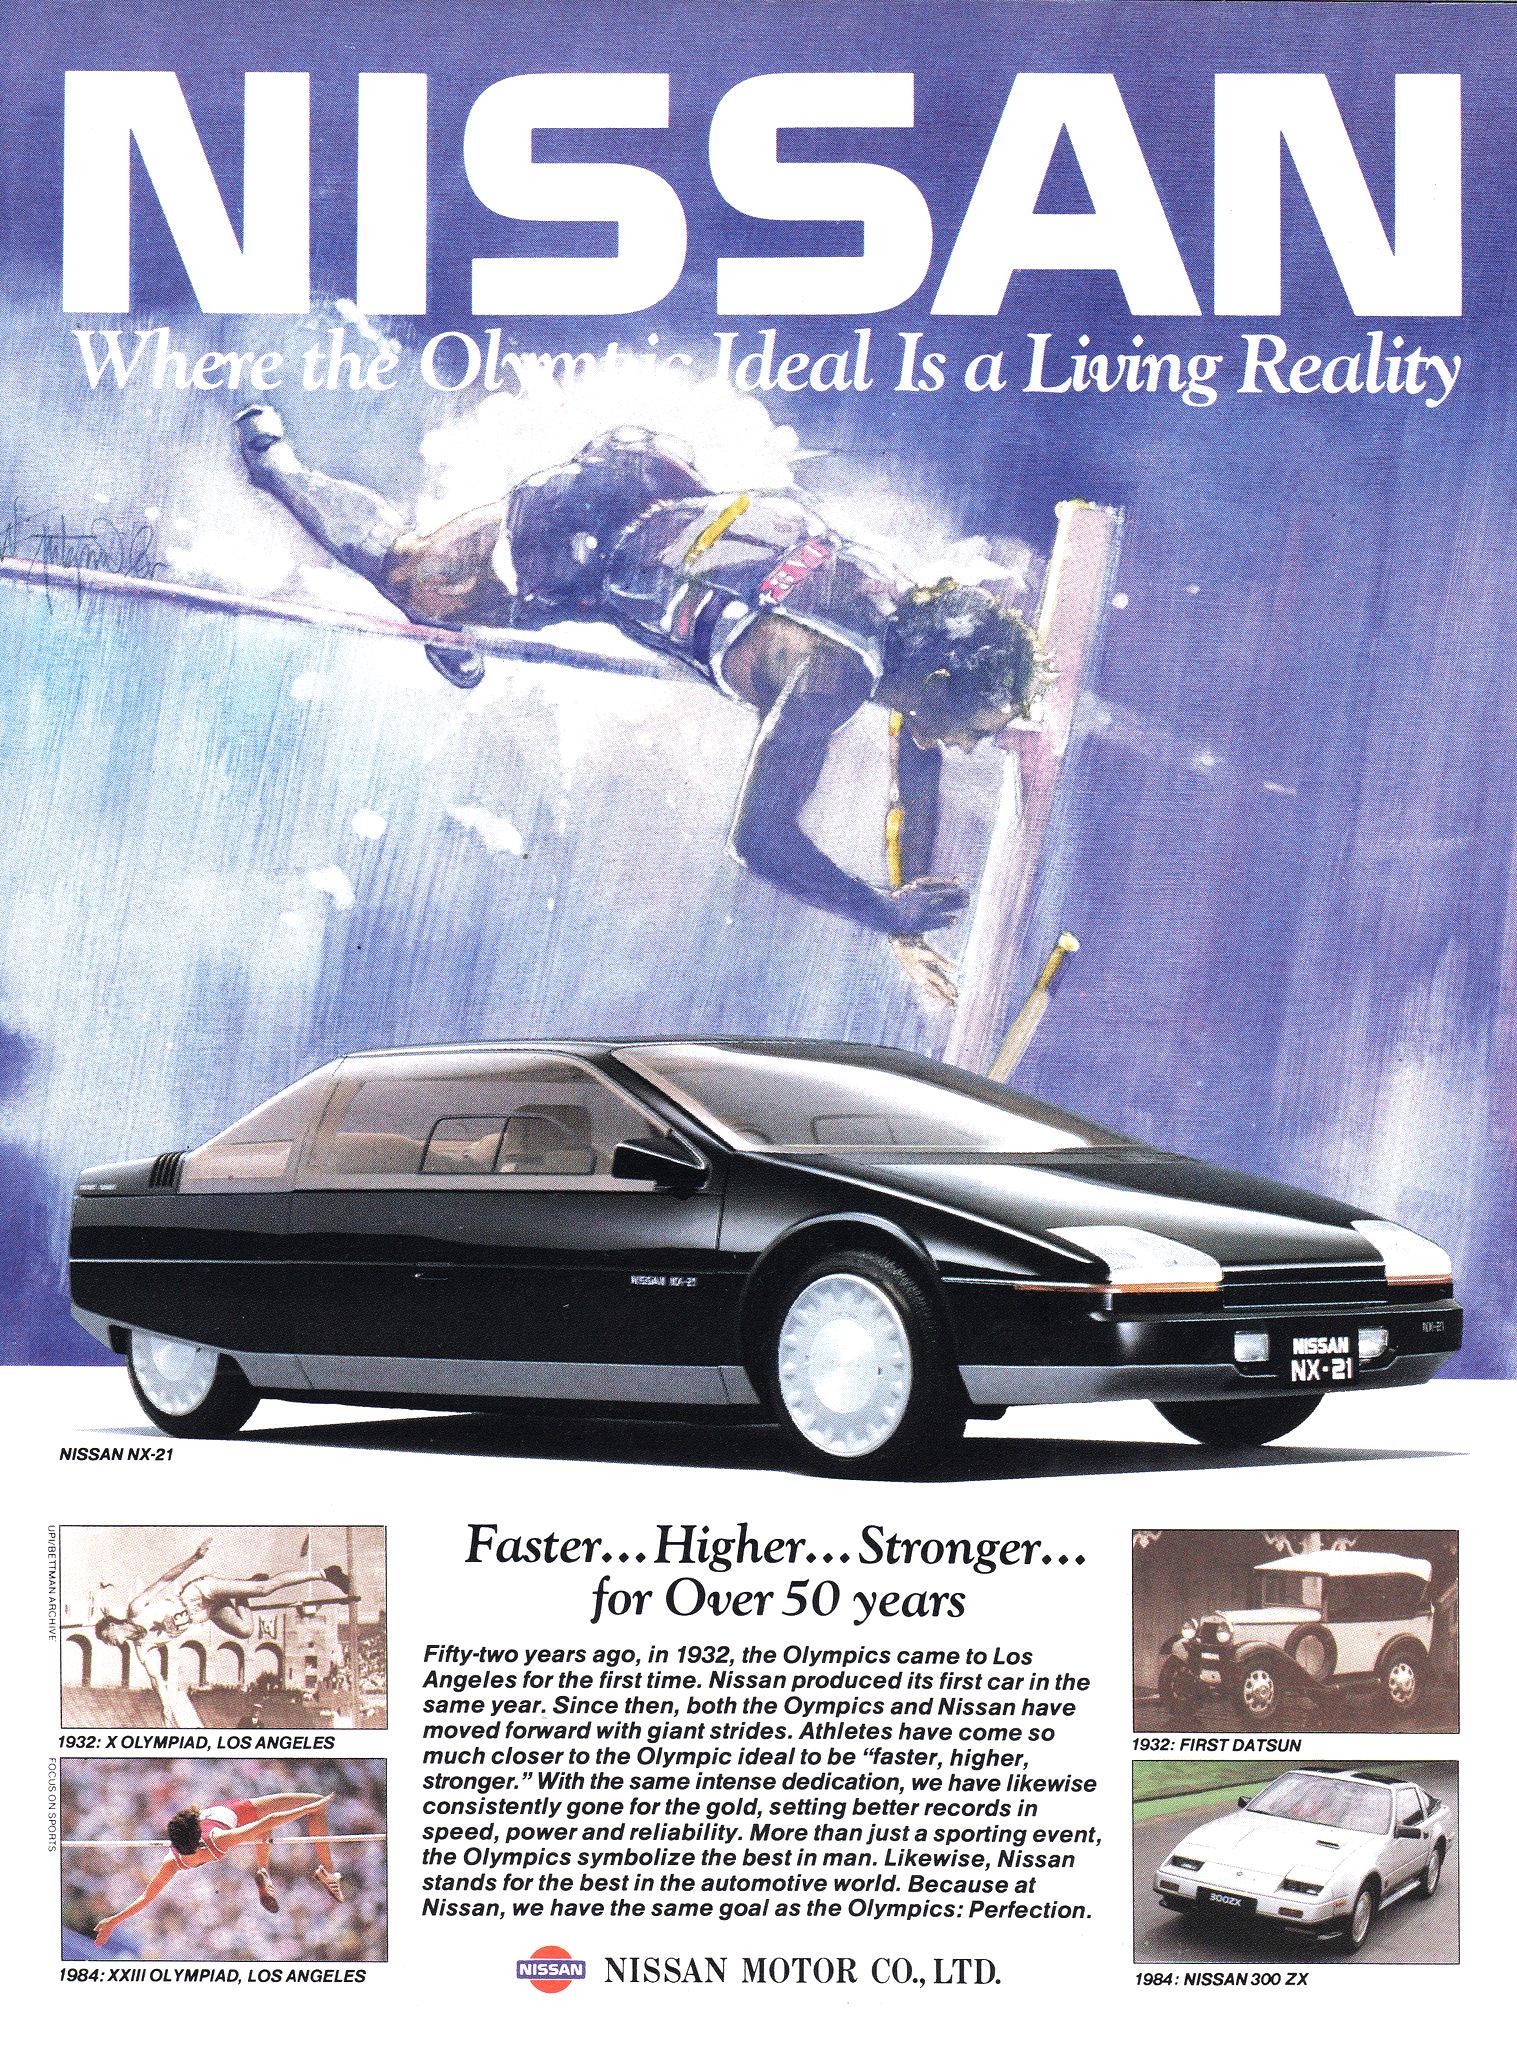 1983 nissan nx 21 concepts nissan nx 21 concept ad 1984 vanachro Gallery